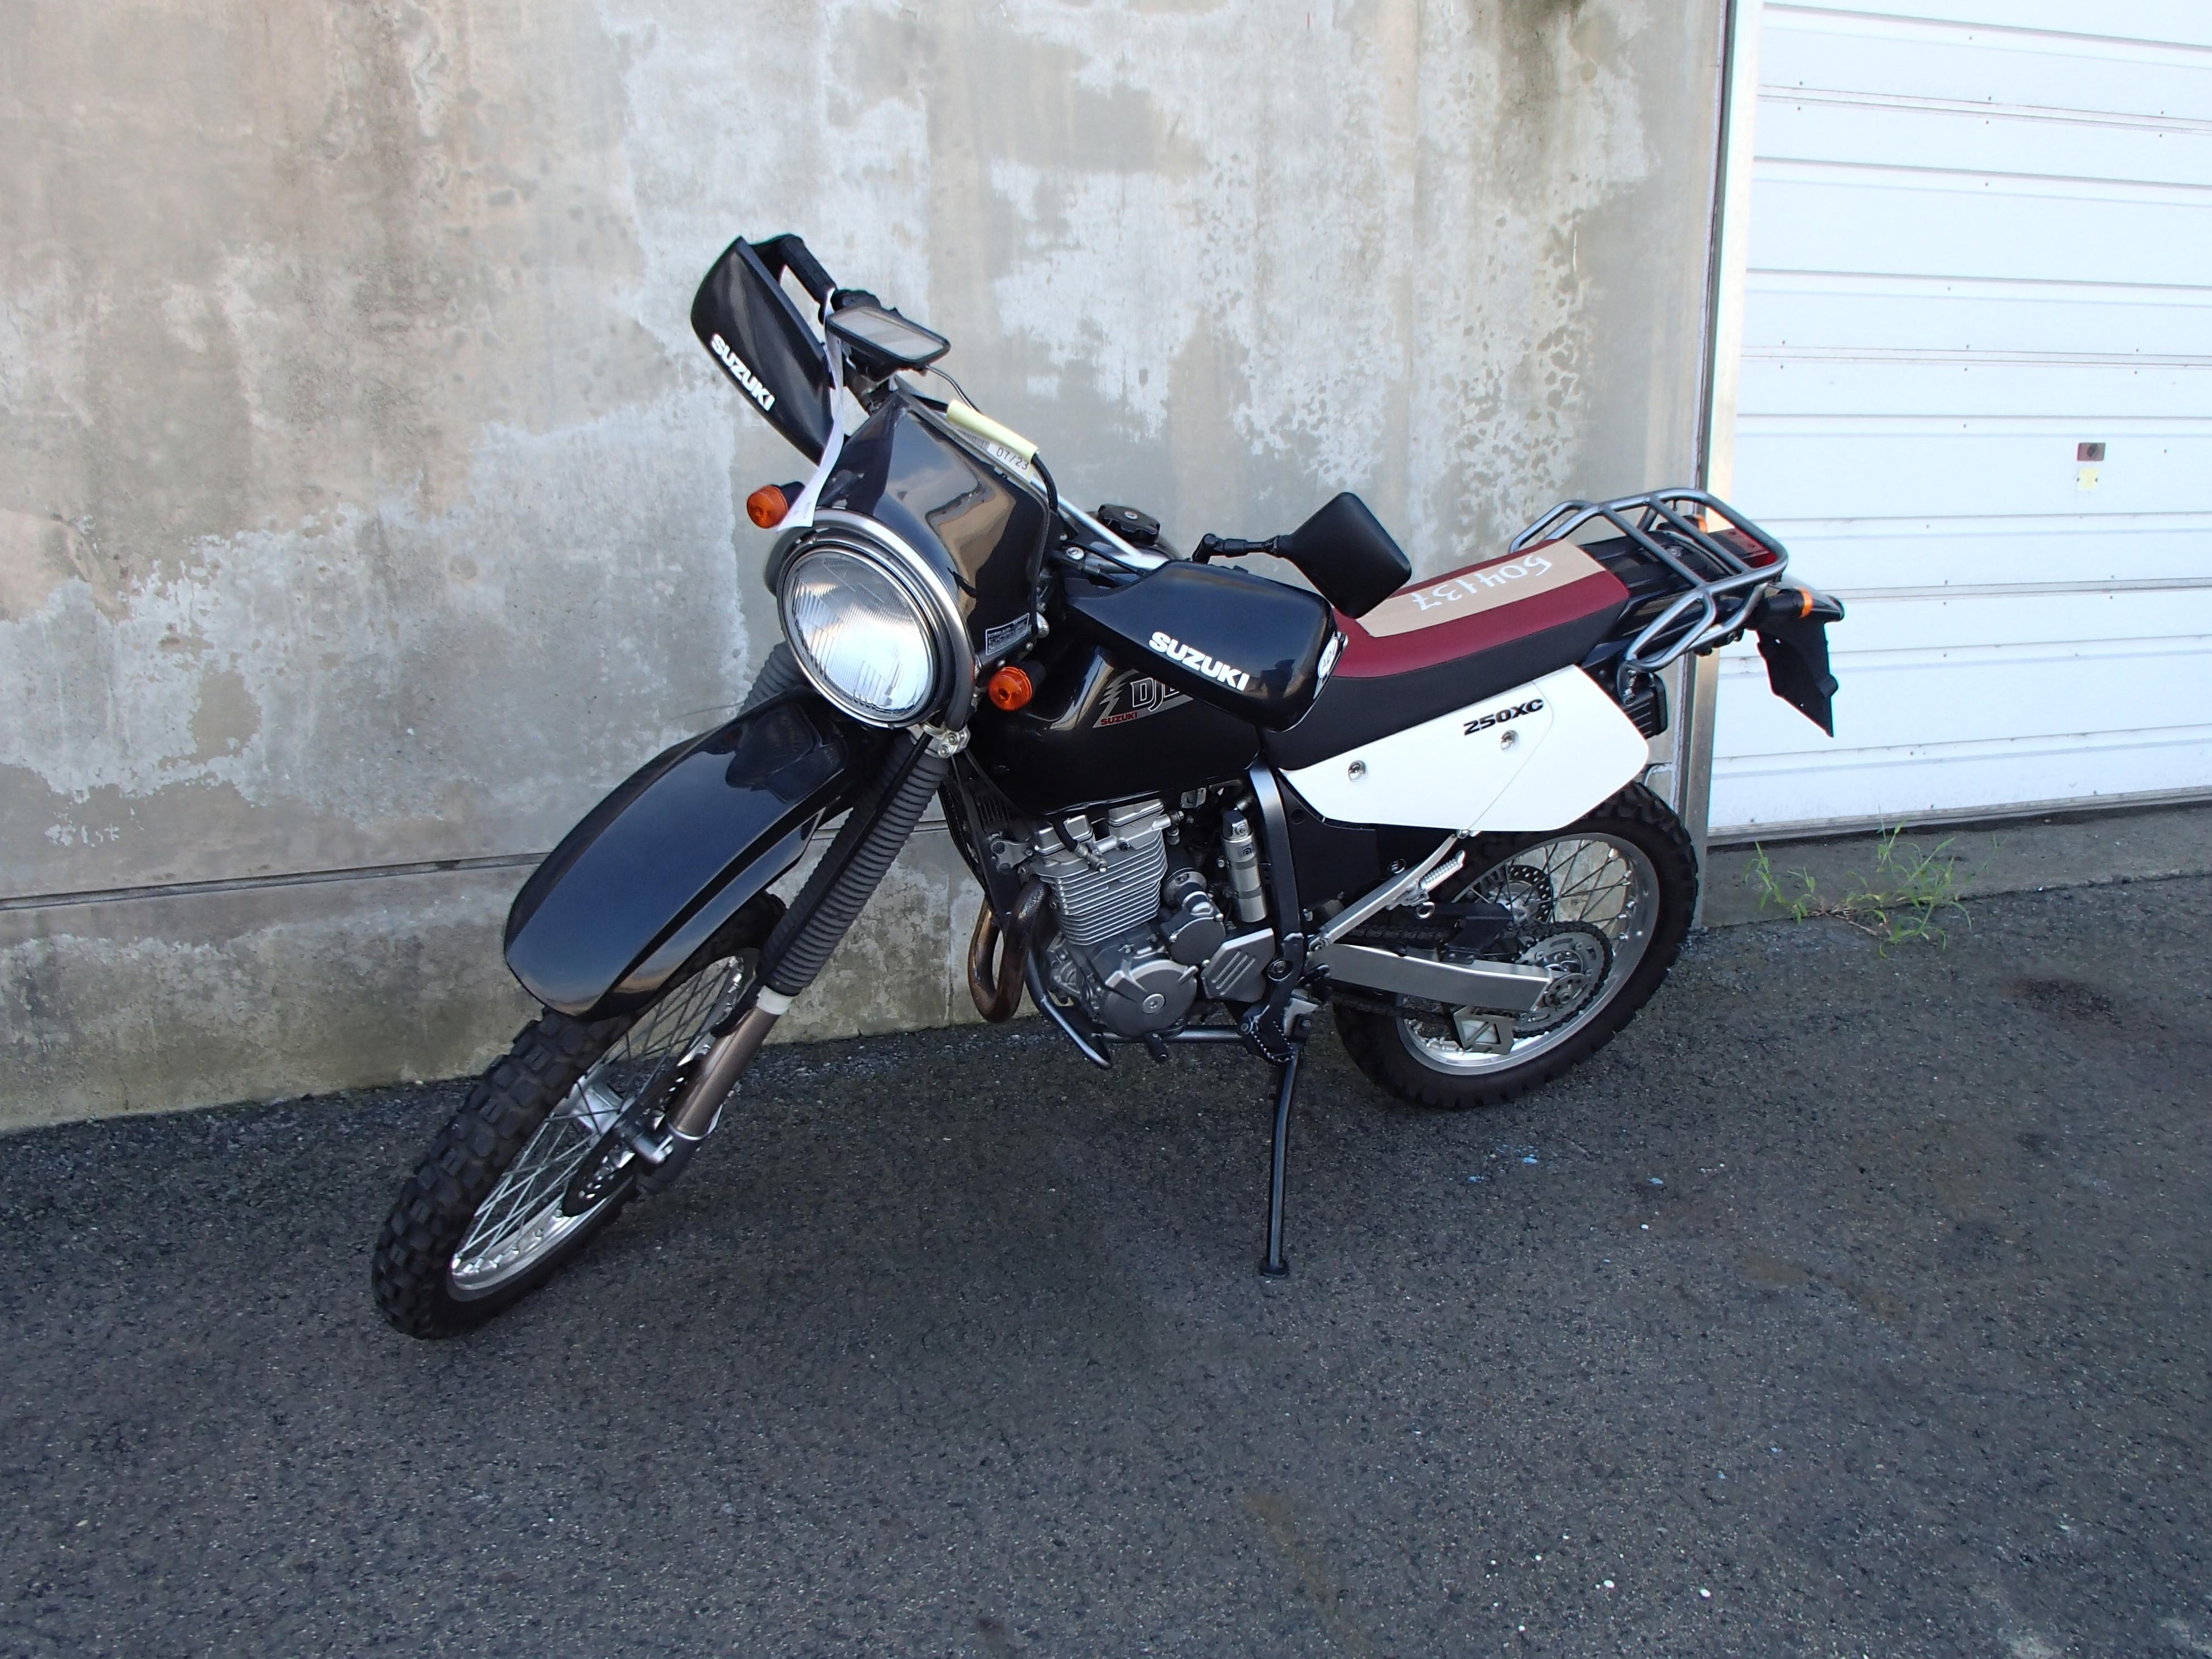 P8010002.JPG